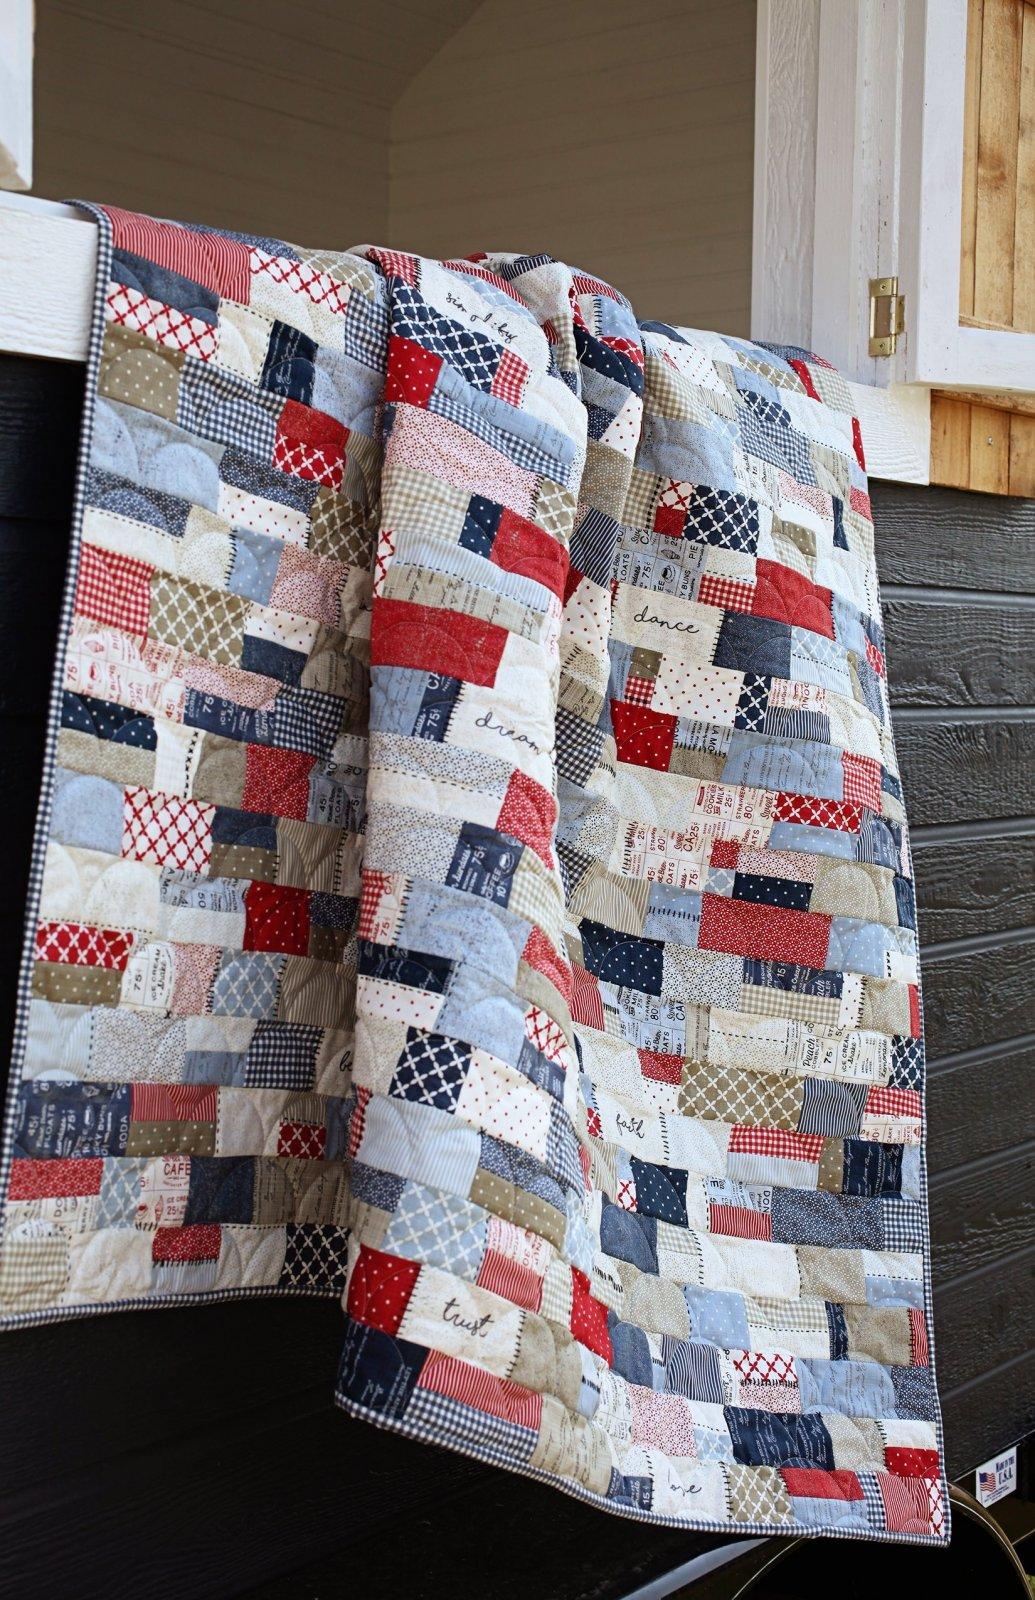 Cobblestone Pattern by Sweetwater